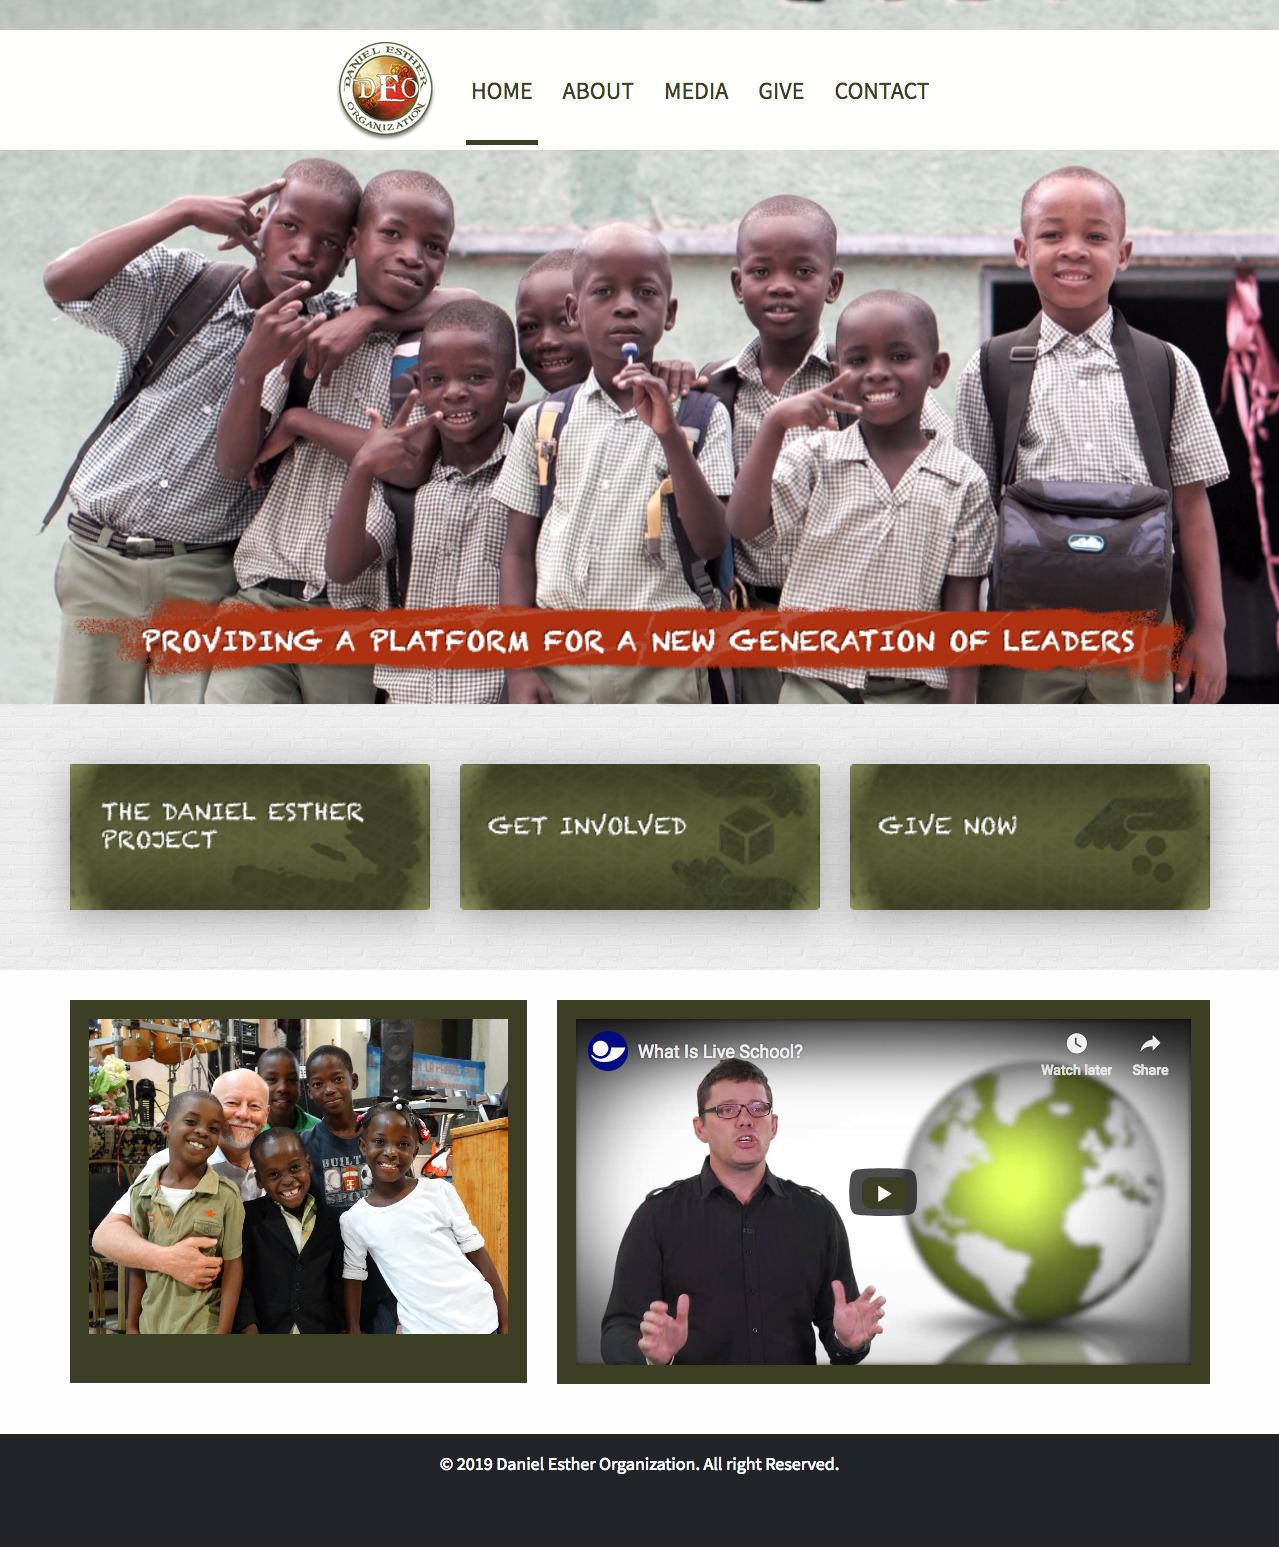 Daniel Esther Organization